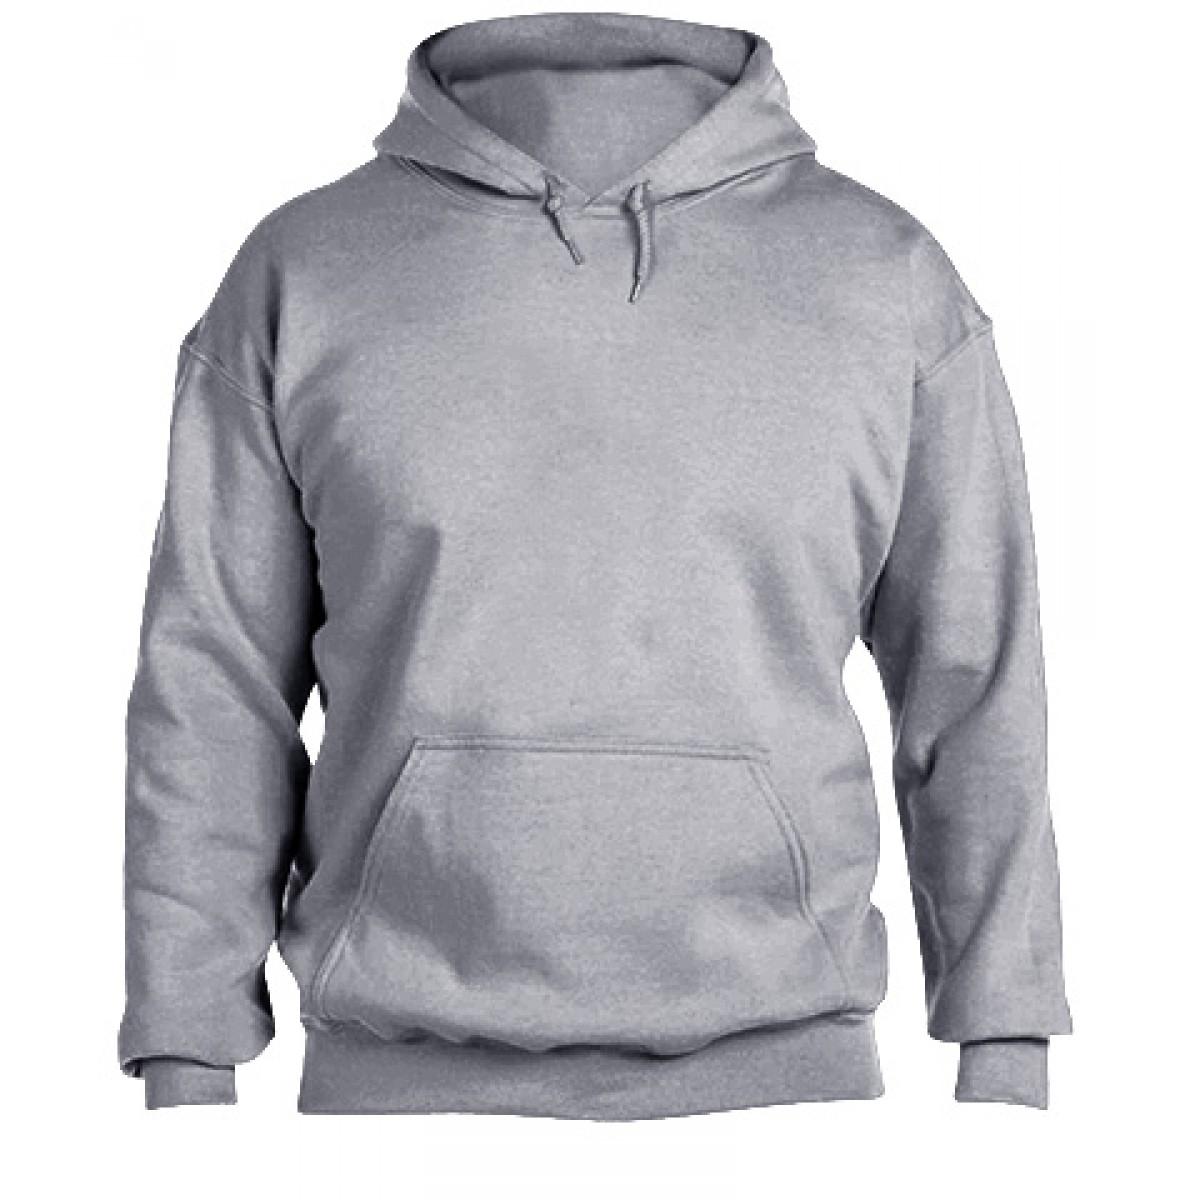 Hooded Sweatshirt 50/50 Heavy Blend-Sports Grey-XL